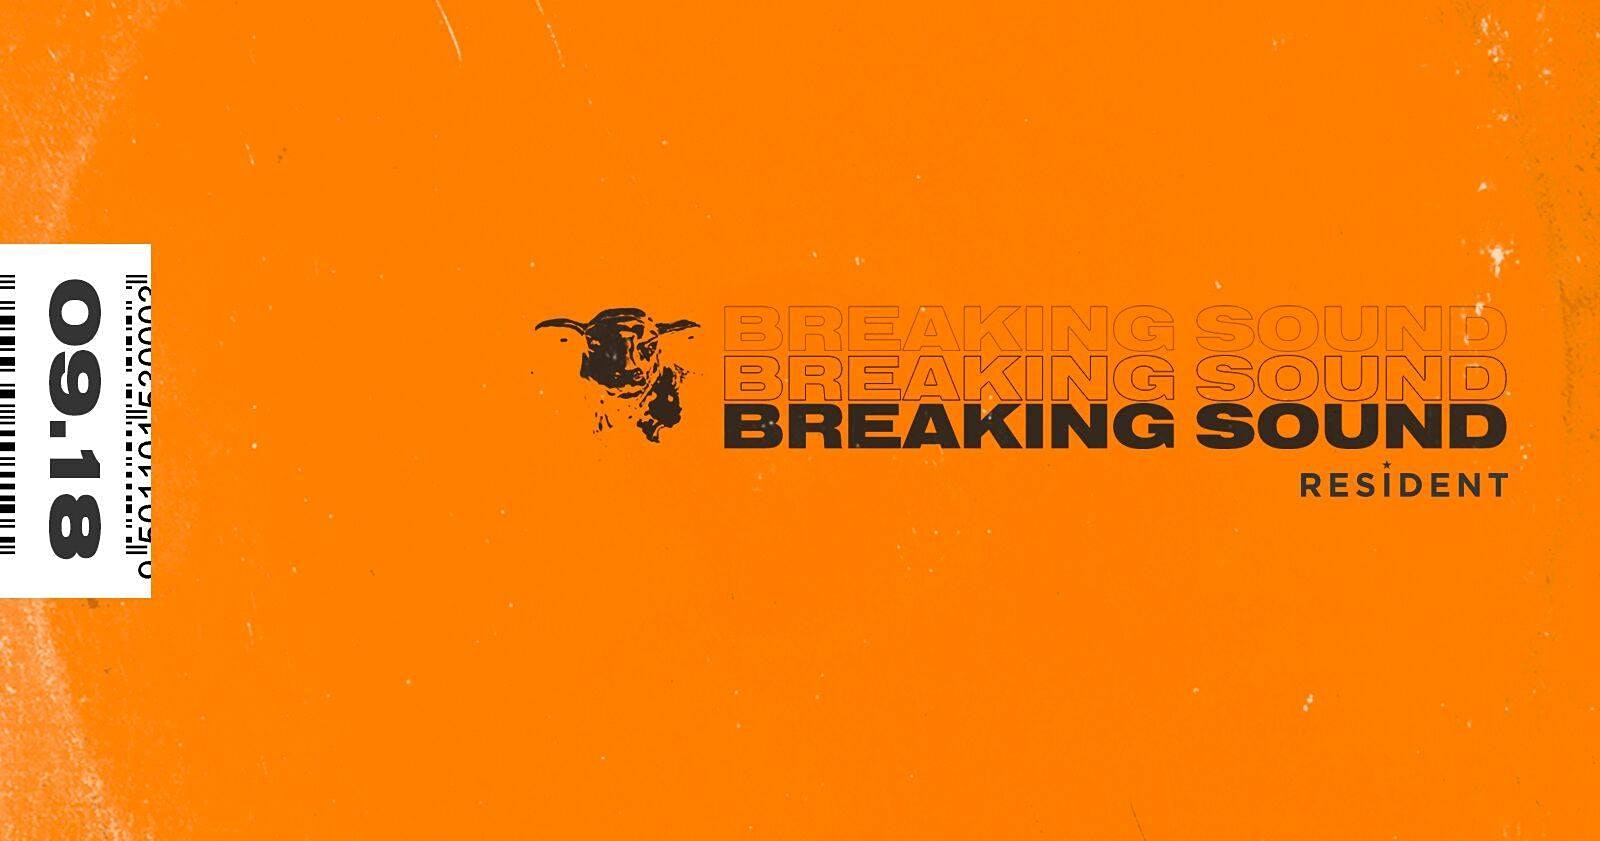 Breaking Sound presents Austin Weber, Enjune, Knopf, Ky Almighty, Will Buck